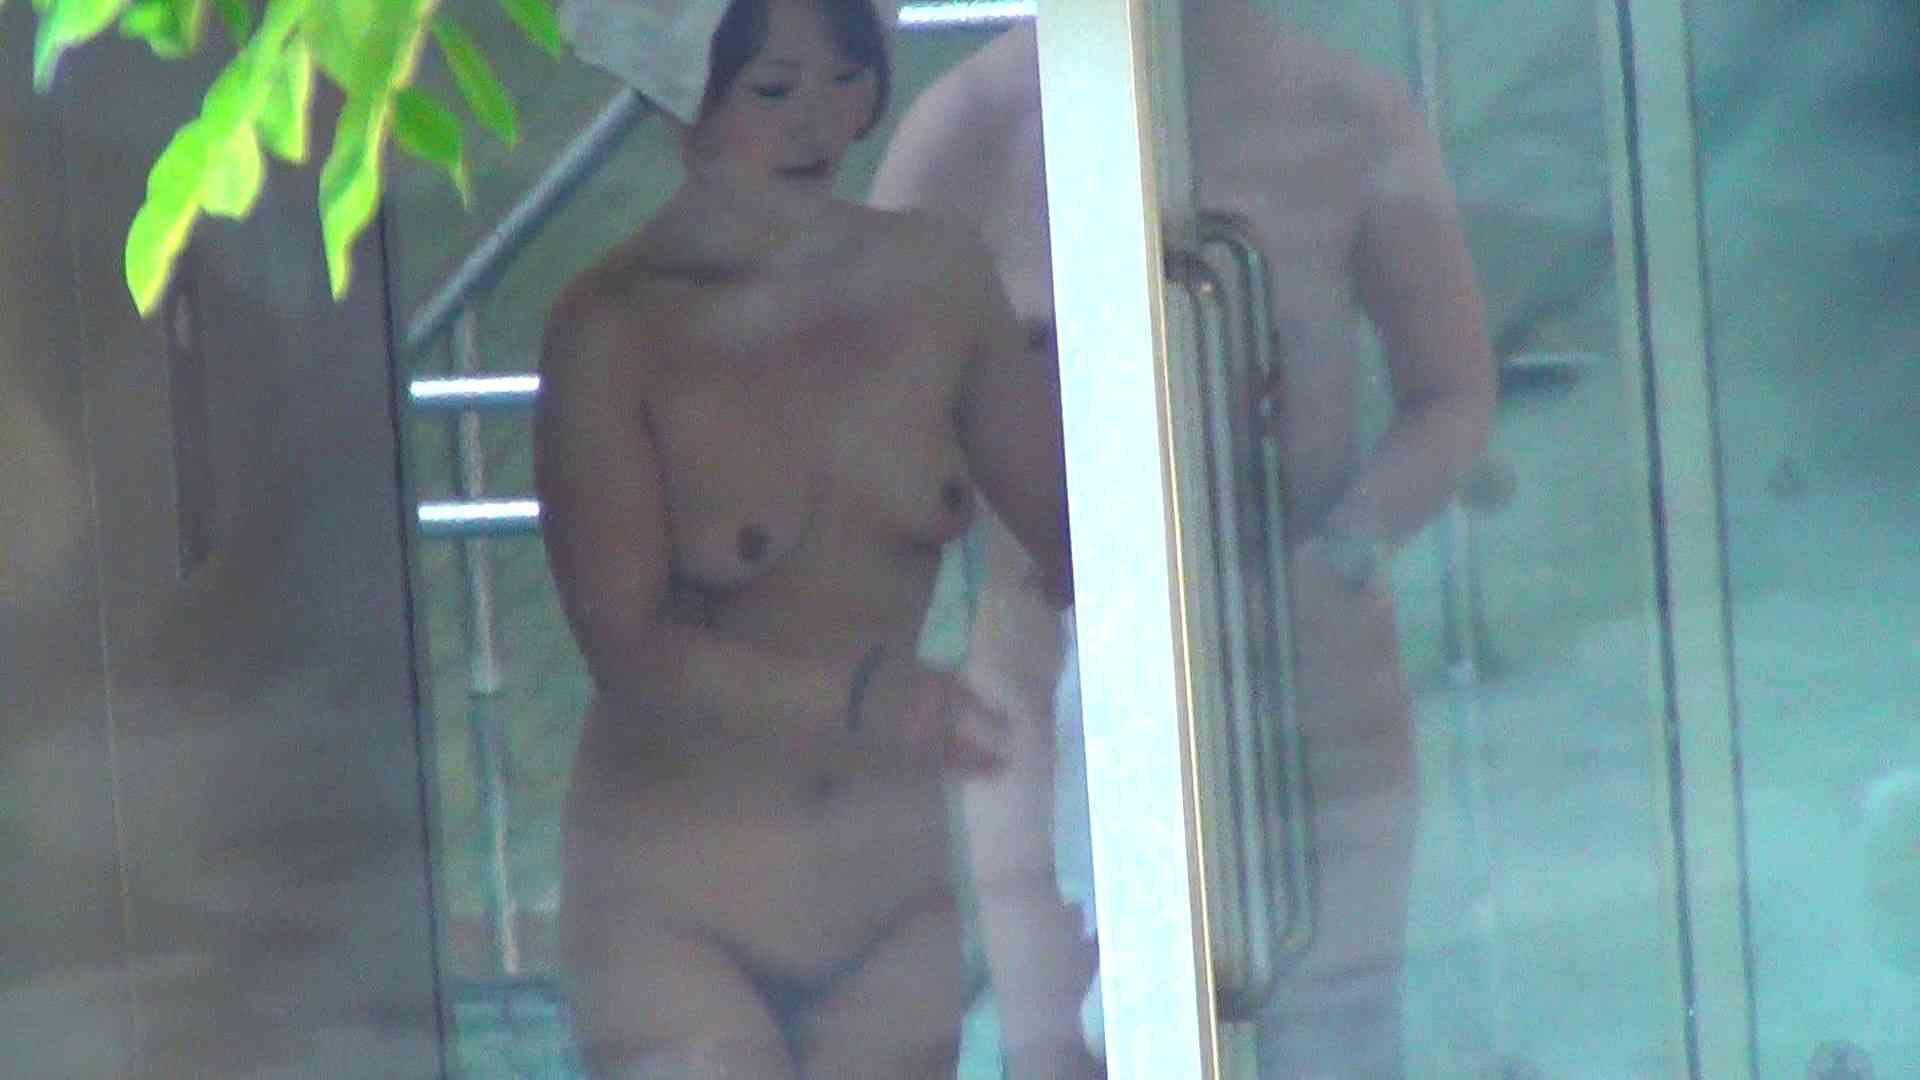 Vol.42 顔と肉体の年齢的ギャップ 色っぽいOL達 セックス画像 54pic 17